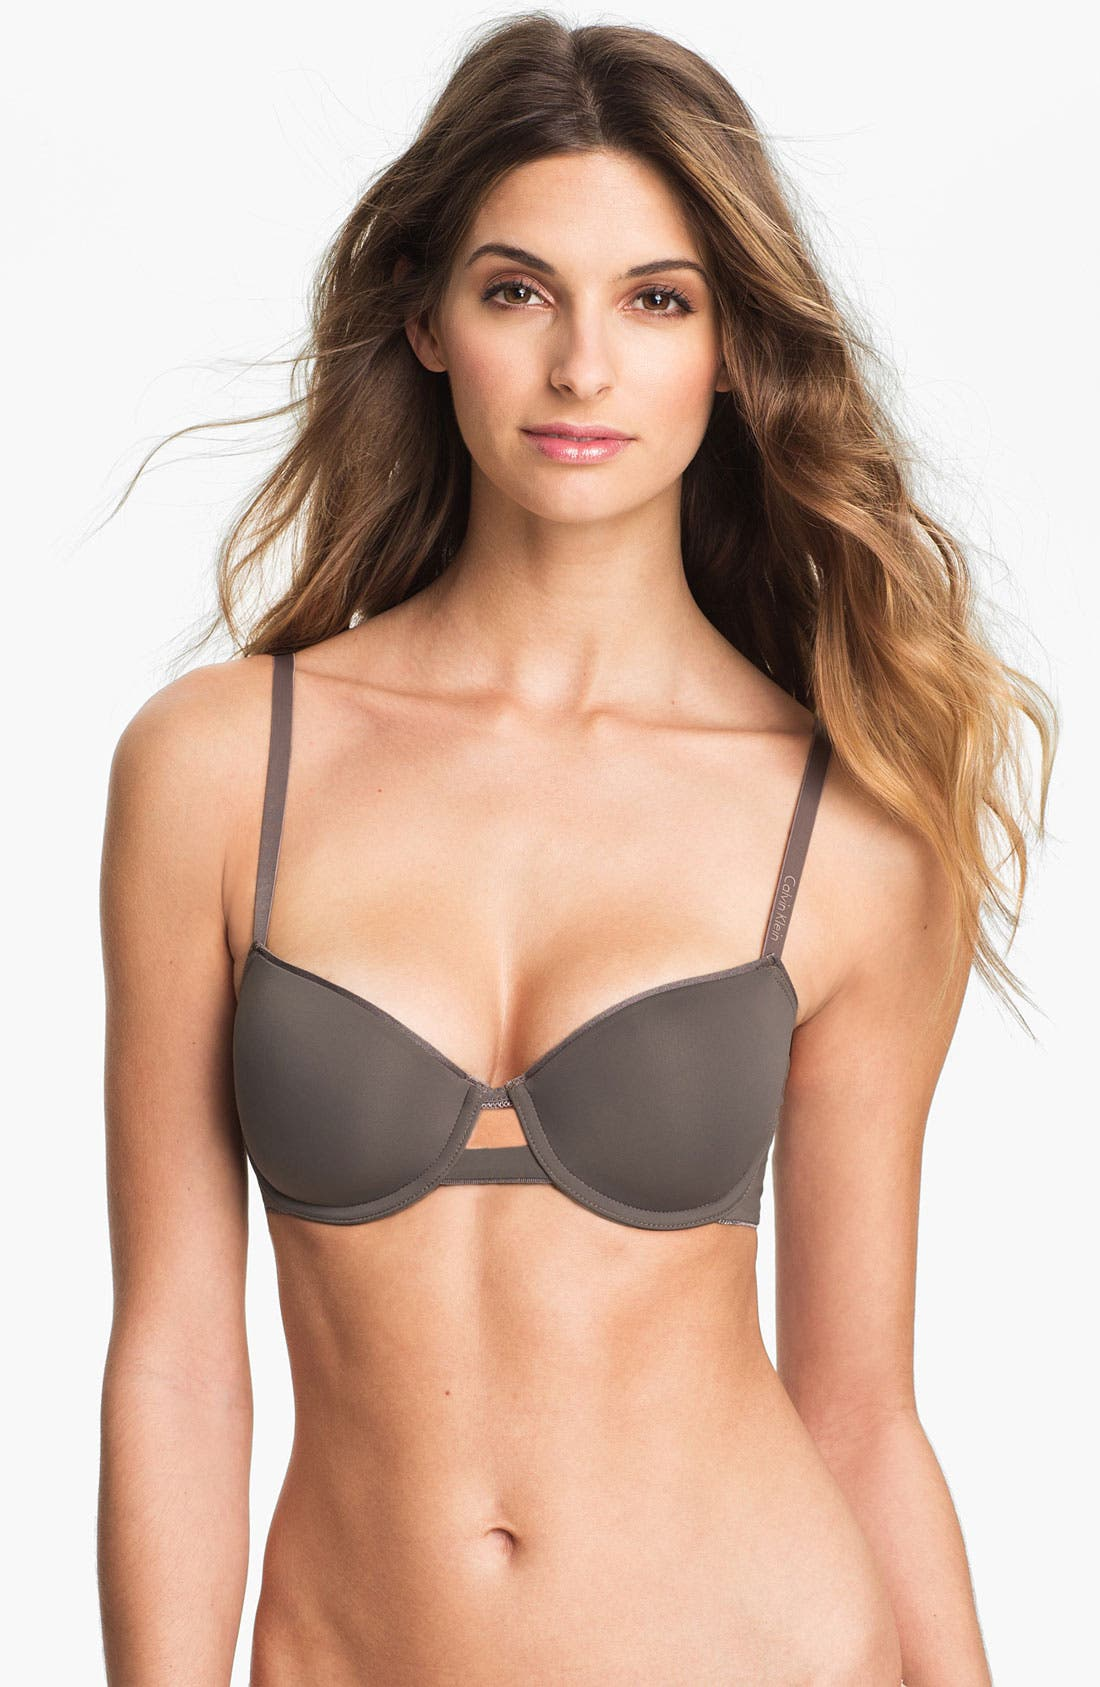 Main Image - Calvin Klein 'Seductive Comfort' Underwire Balconette Bra